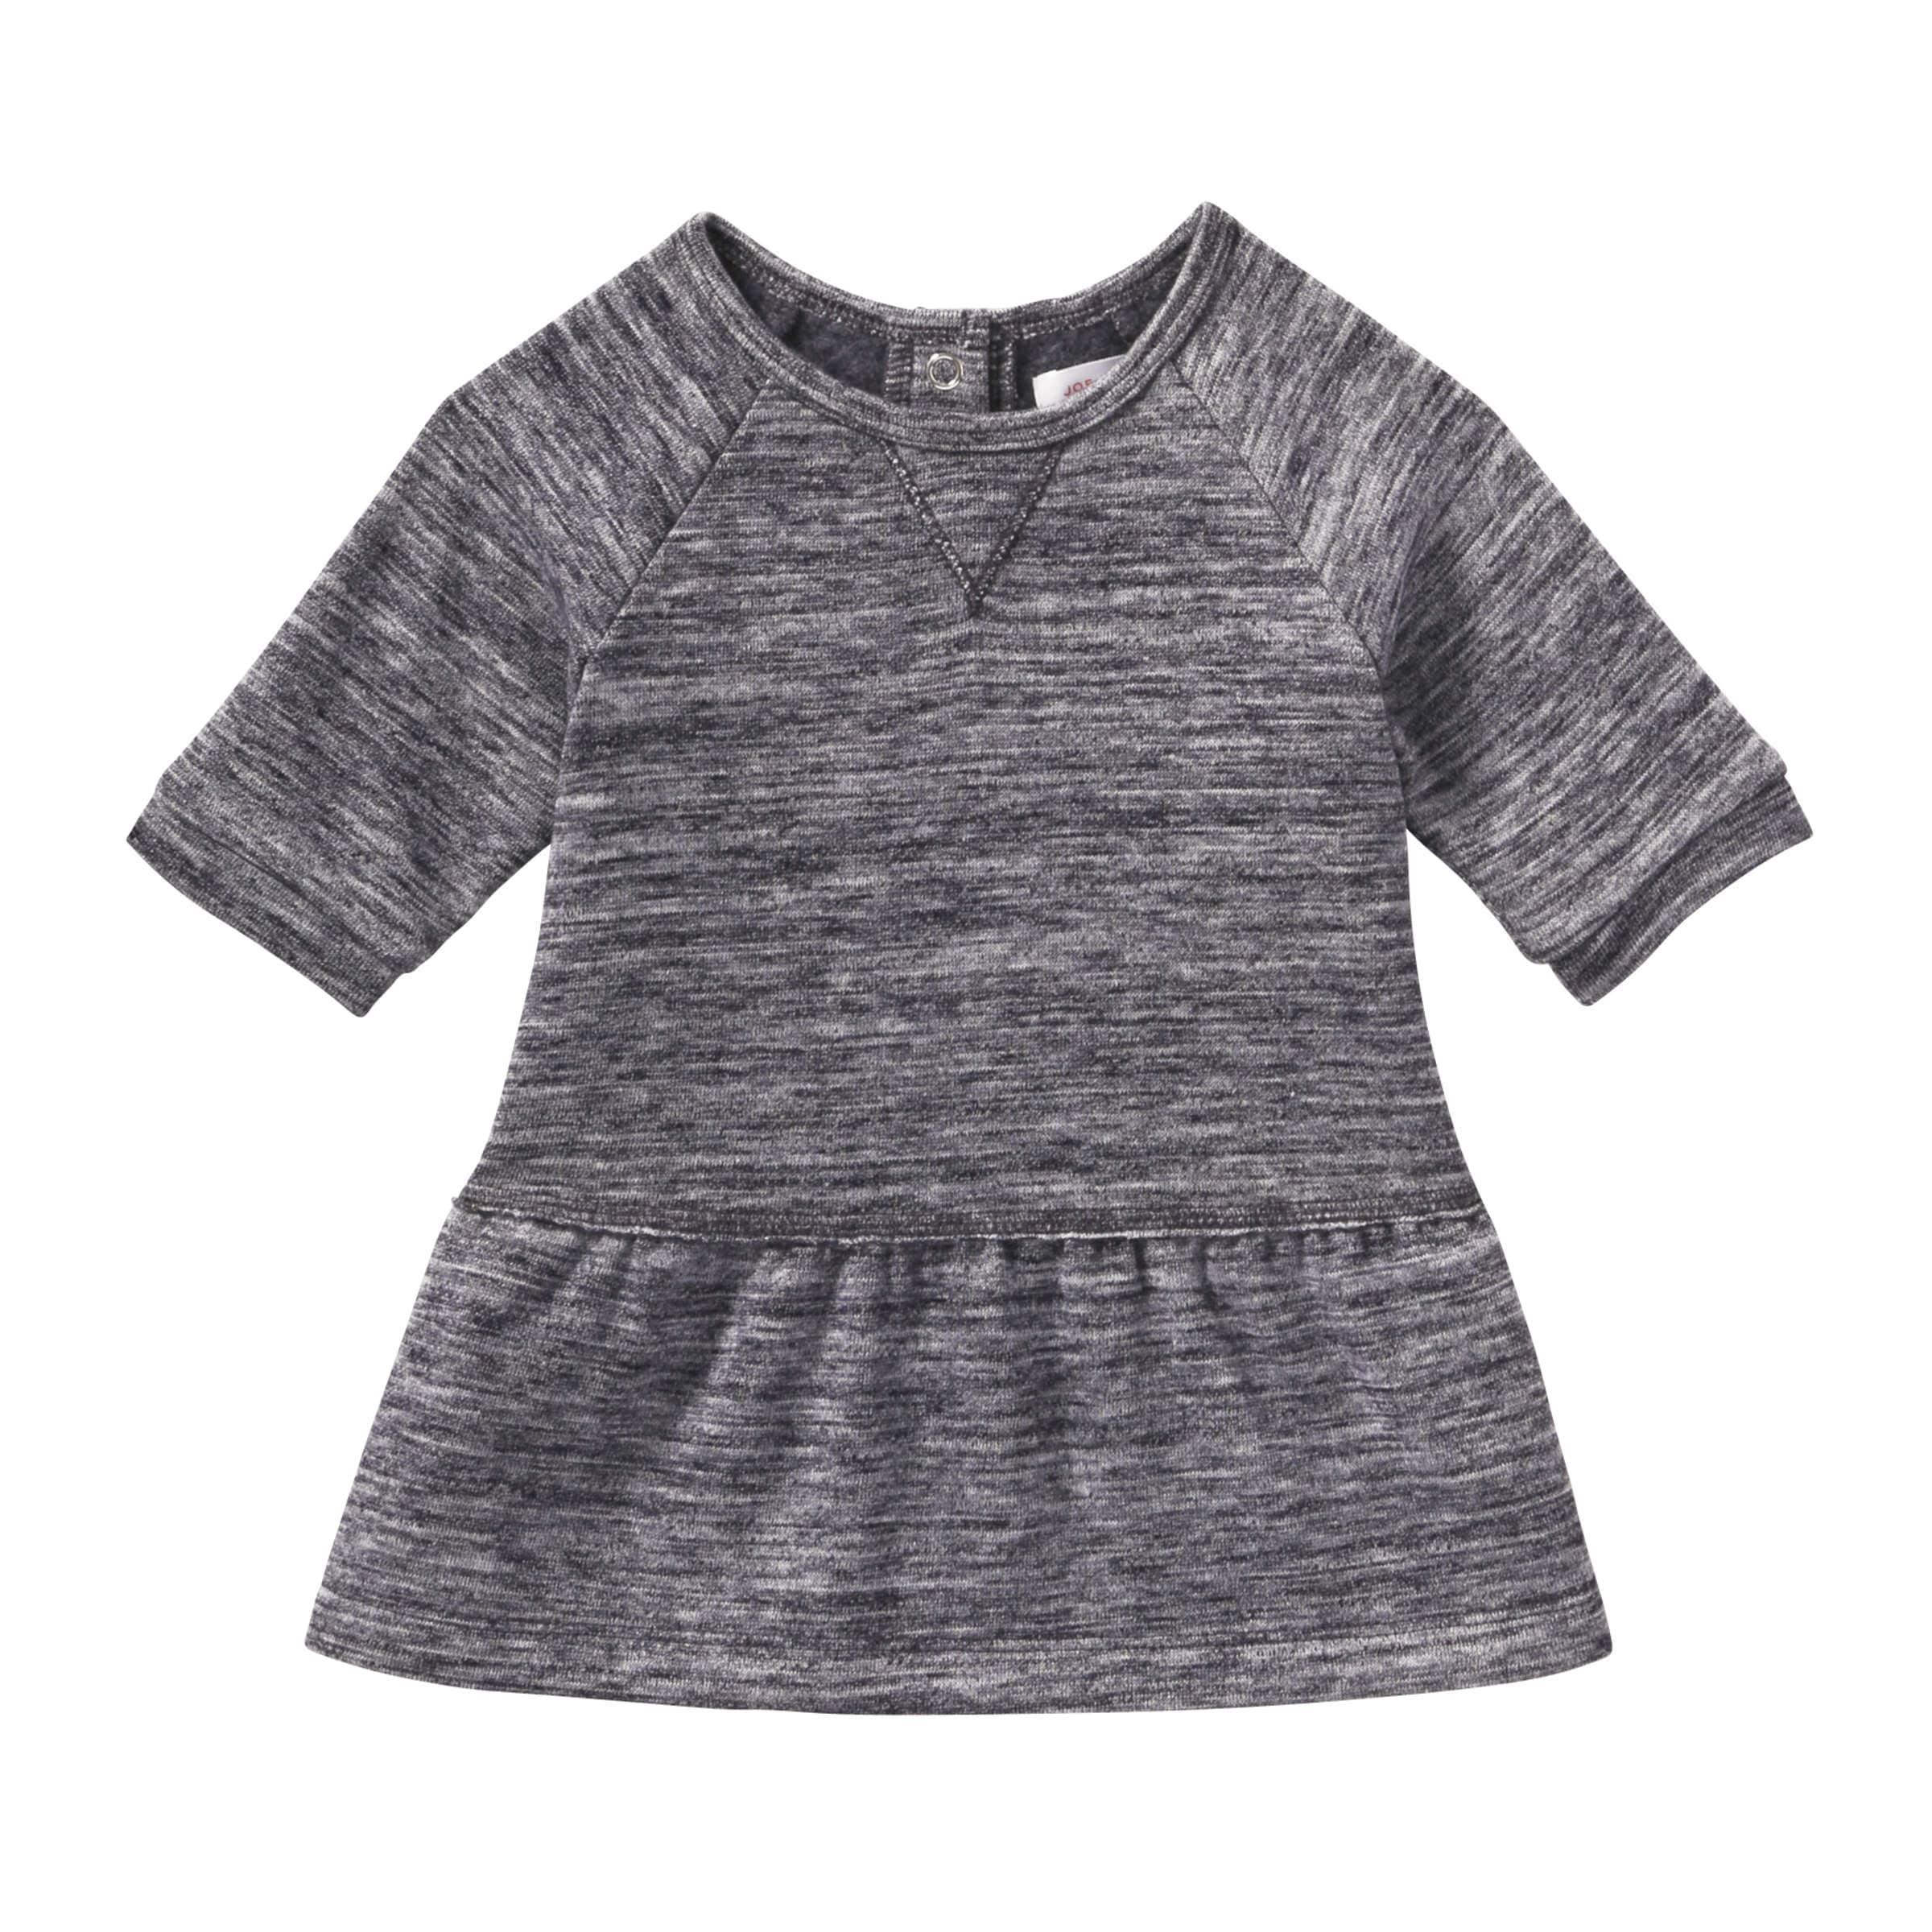 4a00d5b30ca1 Baby Girls  Space Dye Dress in Navy from Joe Fresh